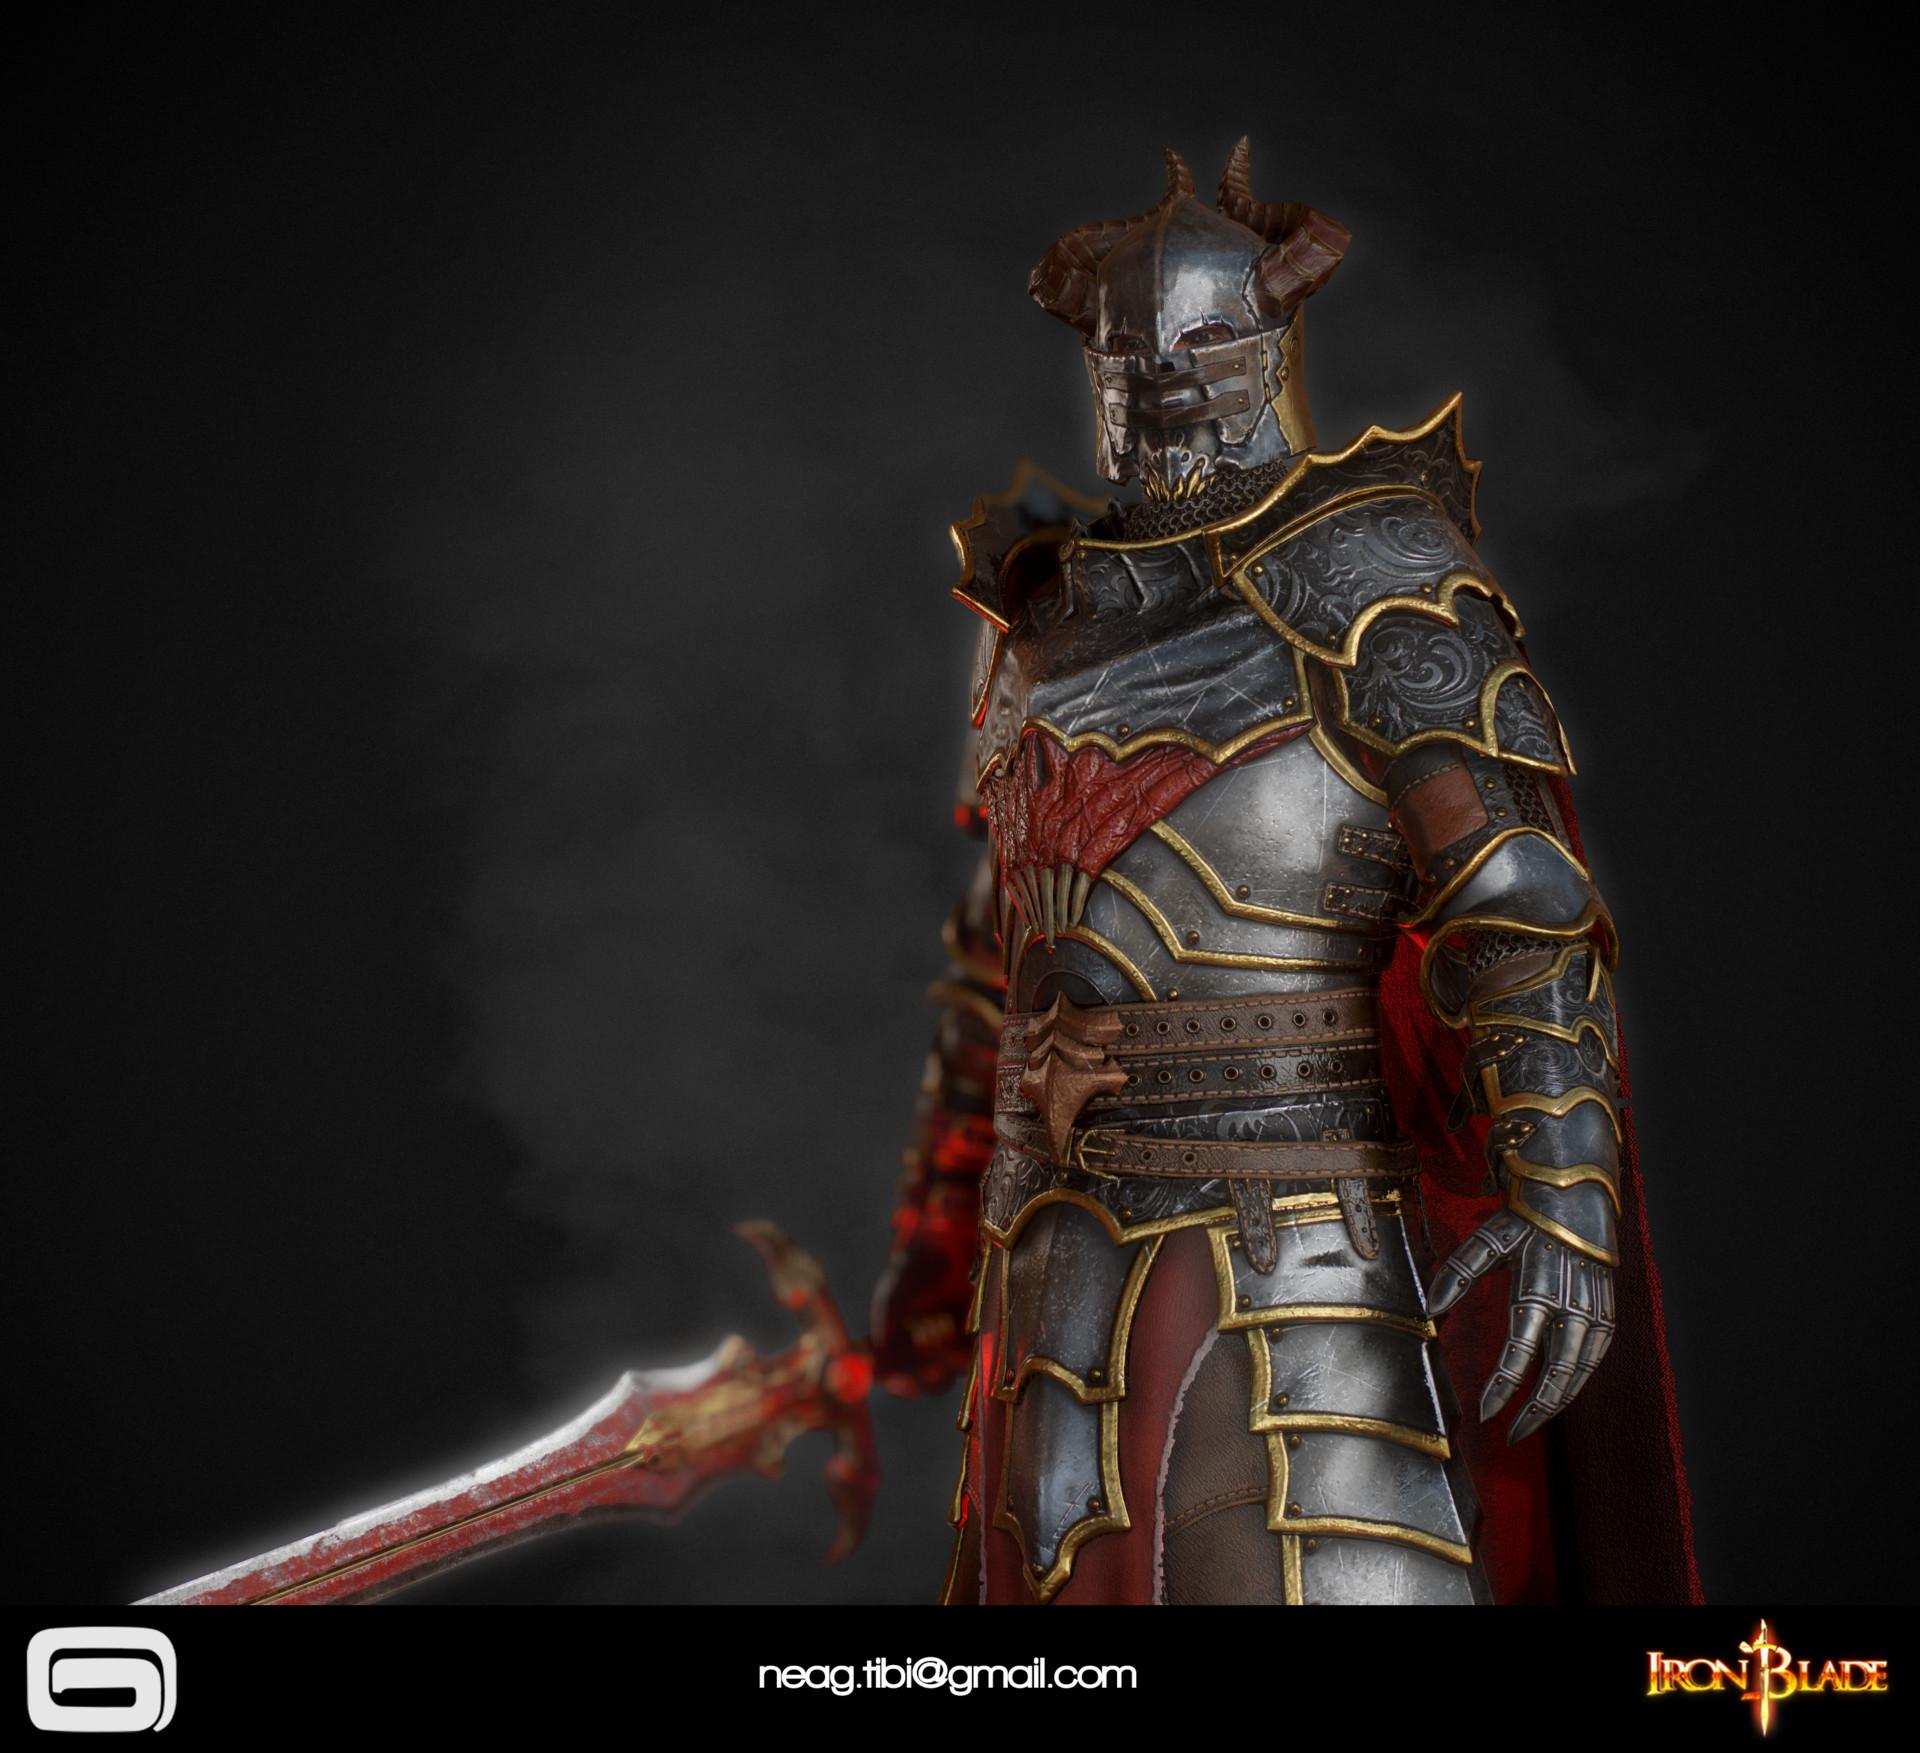 Tibi neag tibi neag iron blade mc armor 10c low poly 08